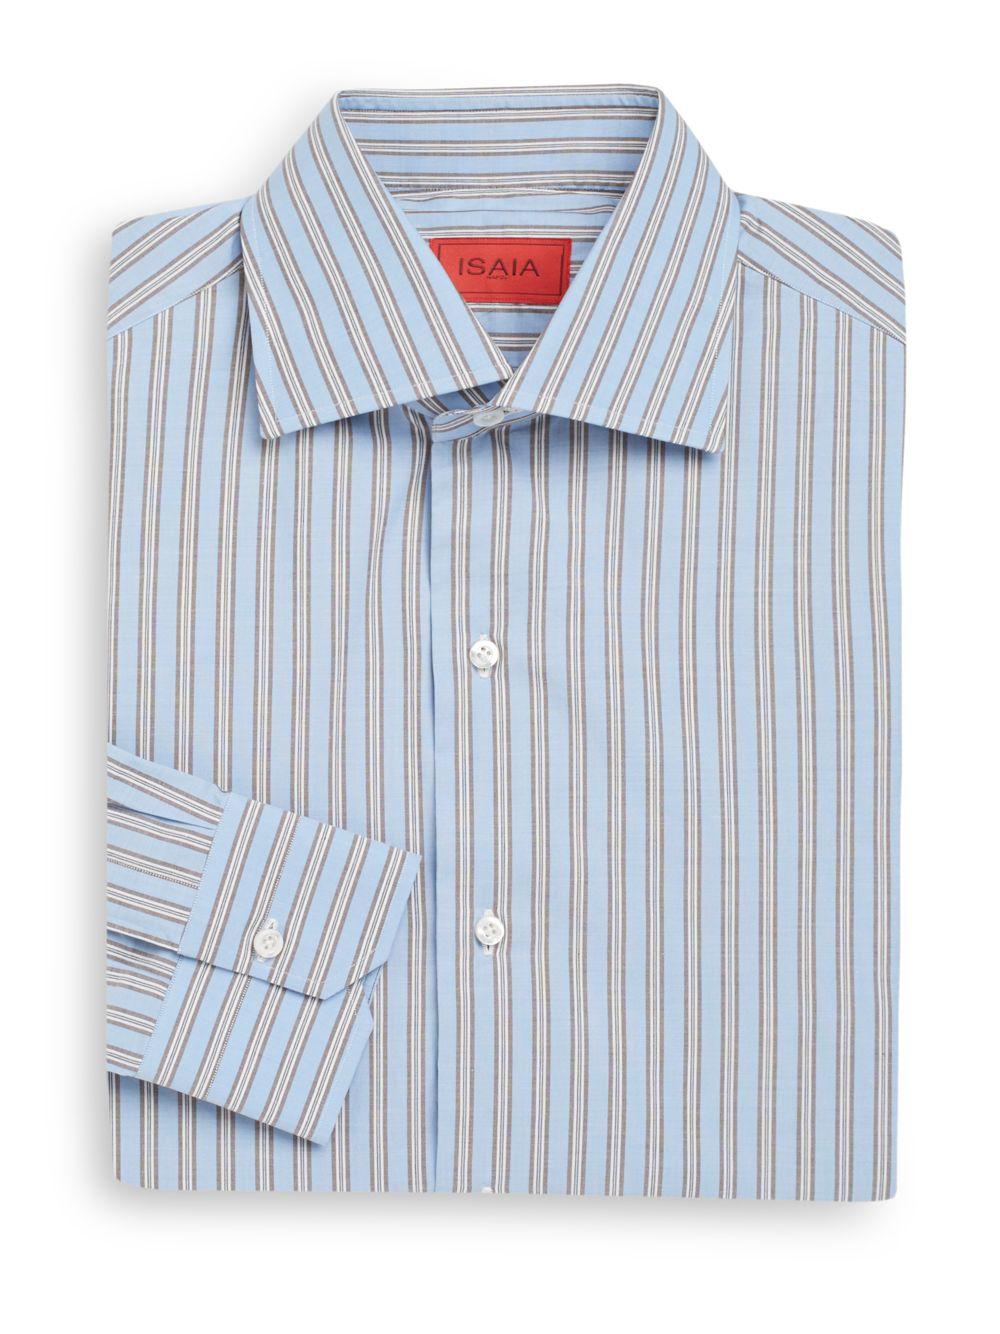 Lyst isaia regular fit multistripe dress shirt in blue for Regular fit dress shirt